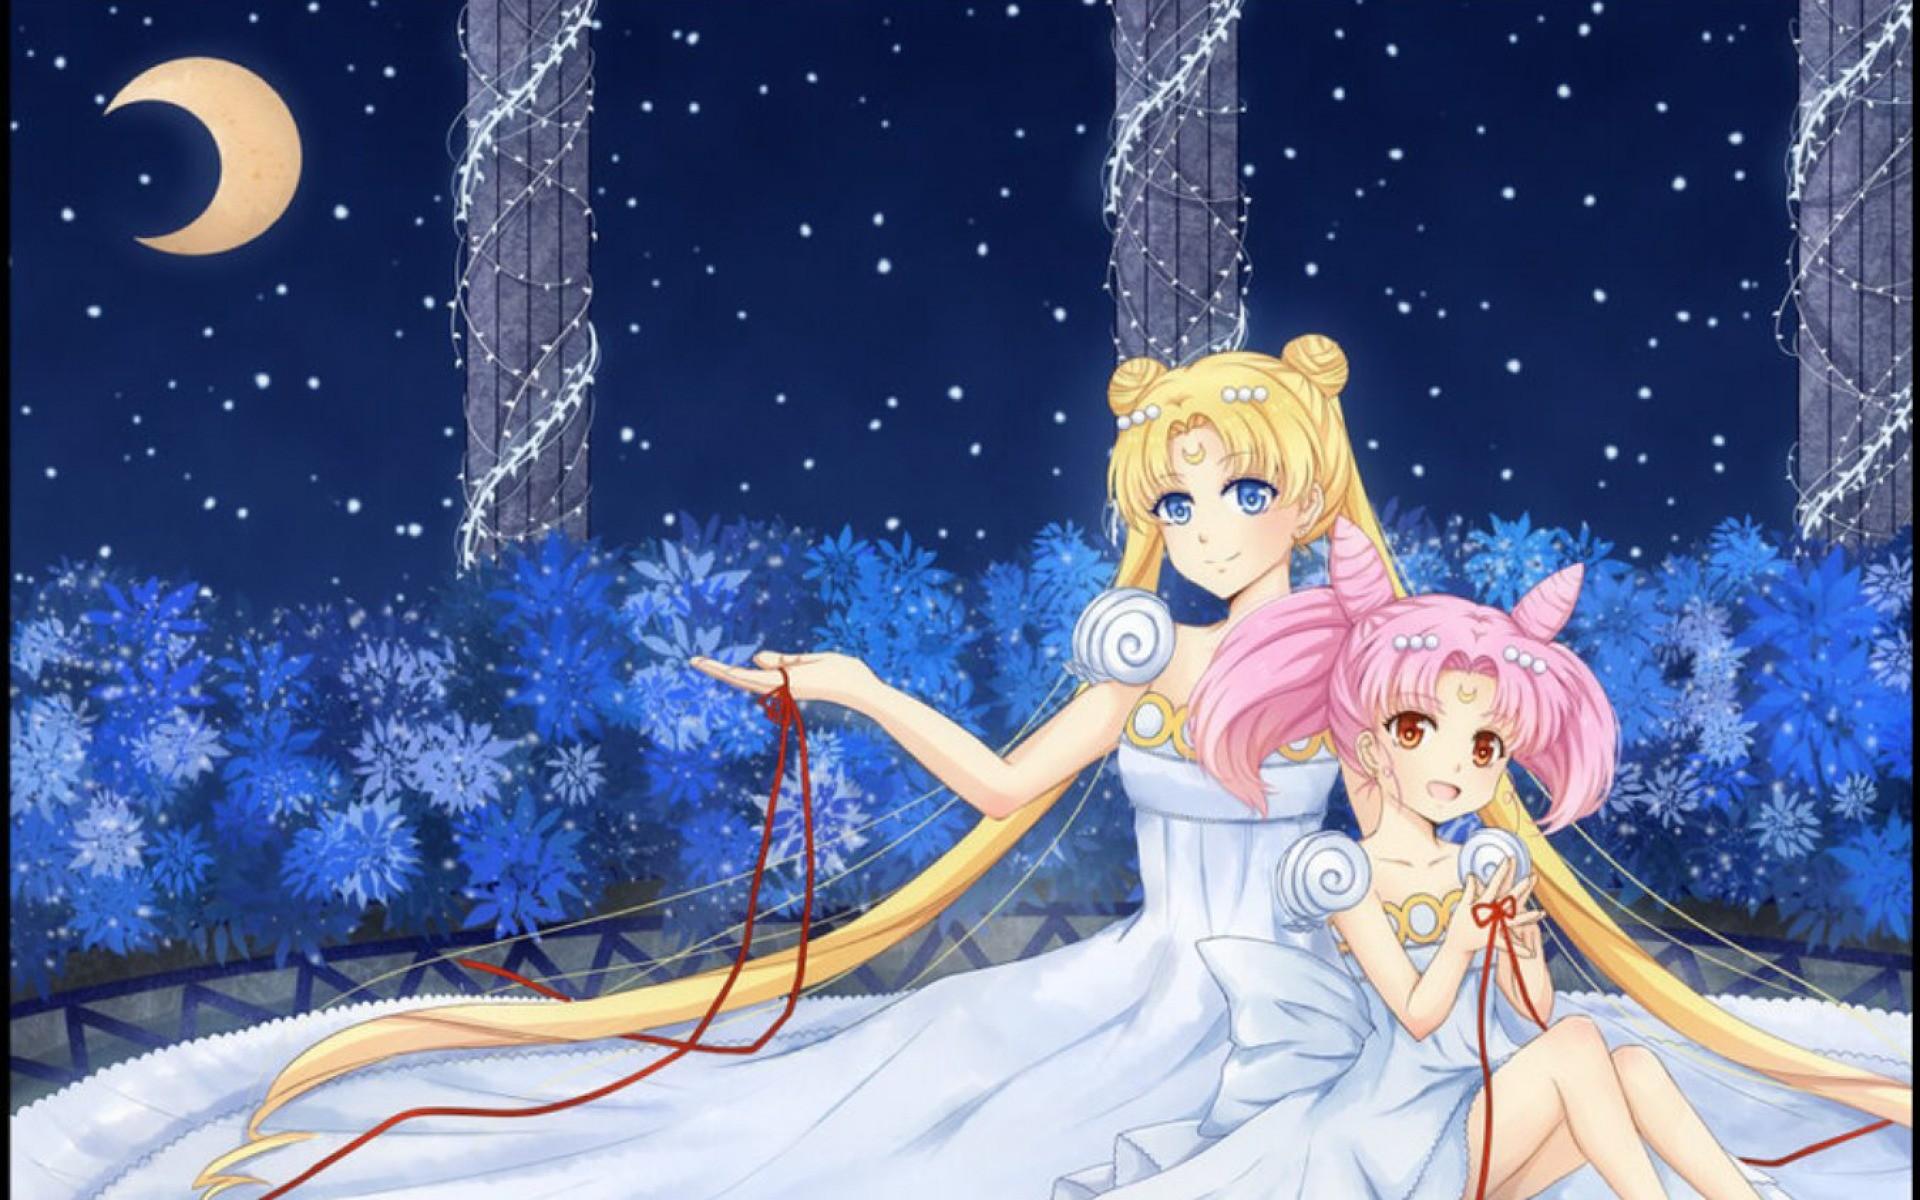 Sailor Moon 1 wallpapers and stock photos